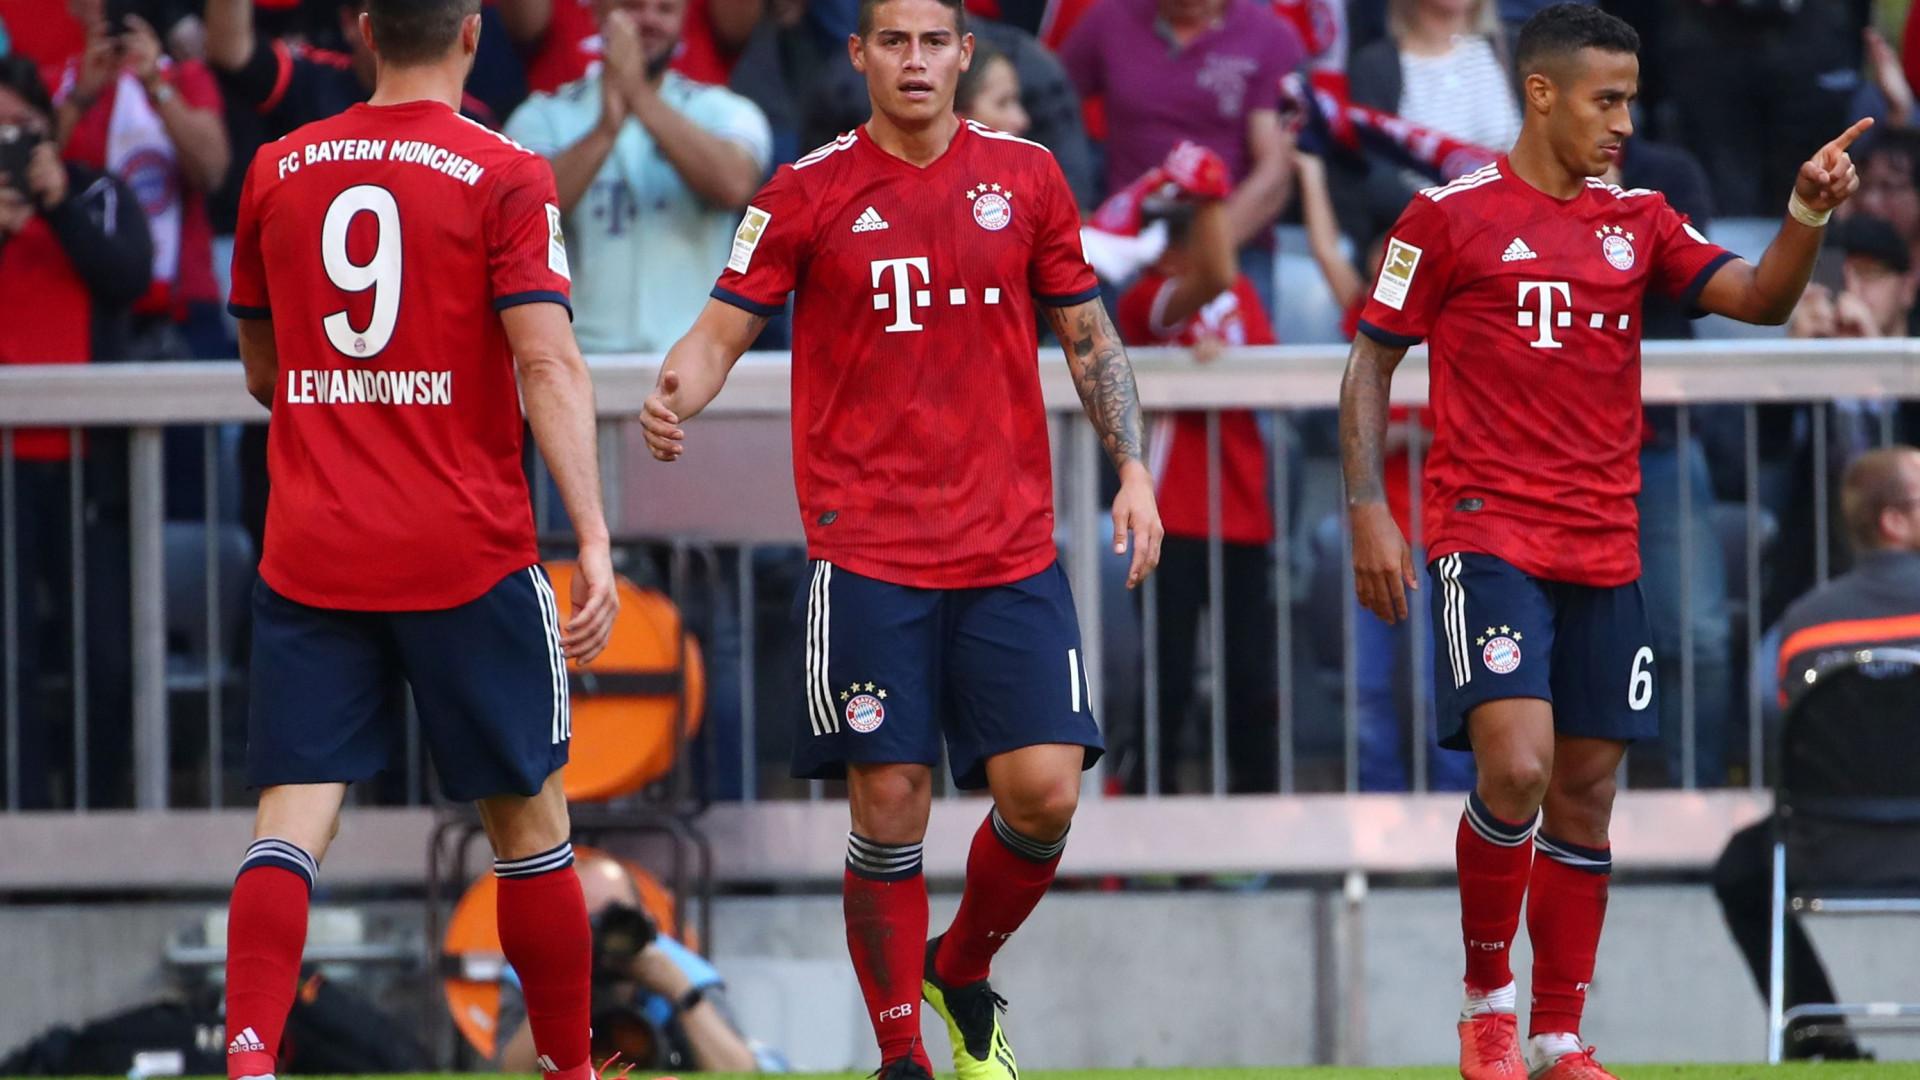 Bayern 'bate' Lerverkusen antes da visita à Luz